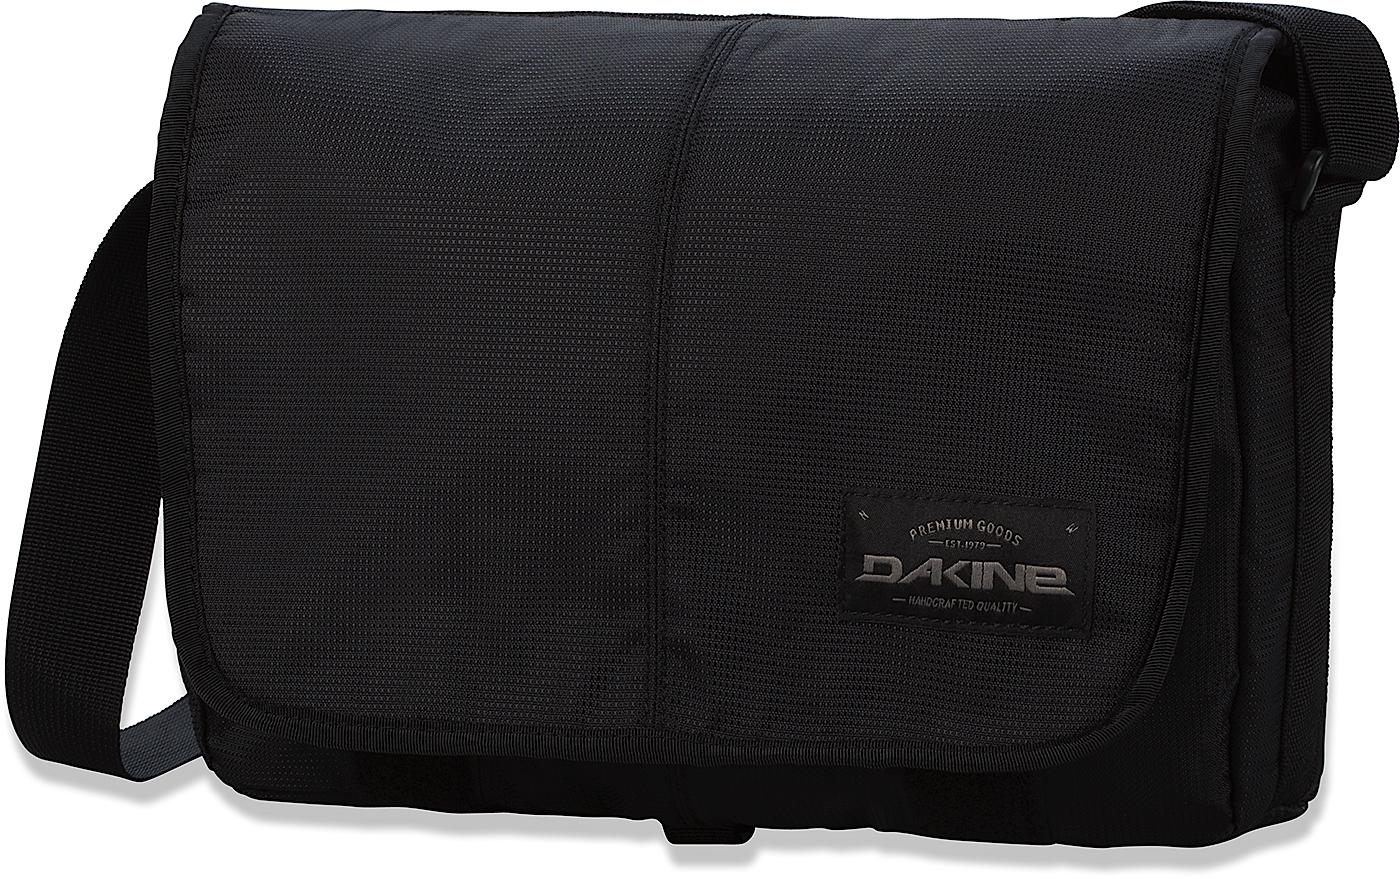 Унисекс Сумка через плечо Dakine OUTLET 8L BLACK 2015S-08130142-Outlet8L-Black.jpg